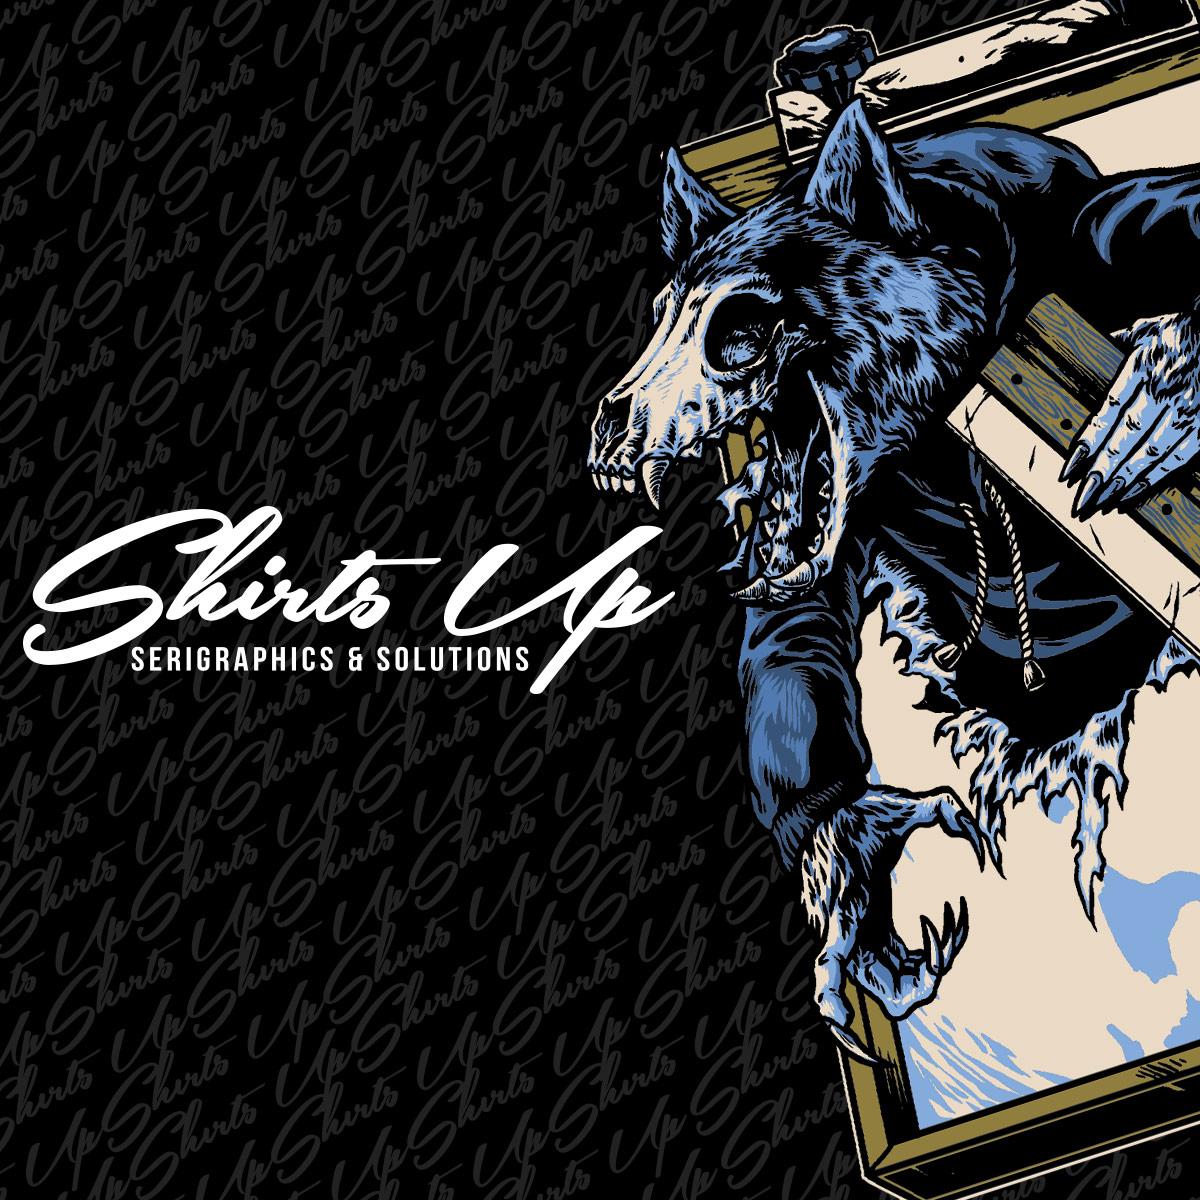 Shirts Up Serigraphics Solutions Anchorage Alaska